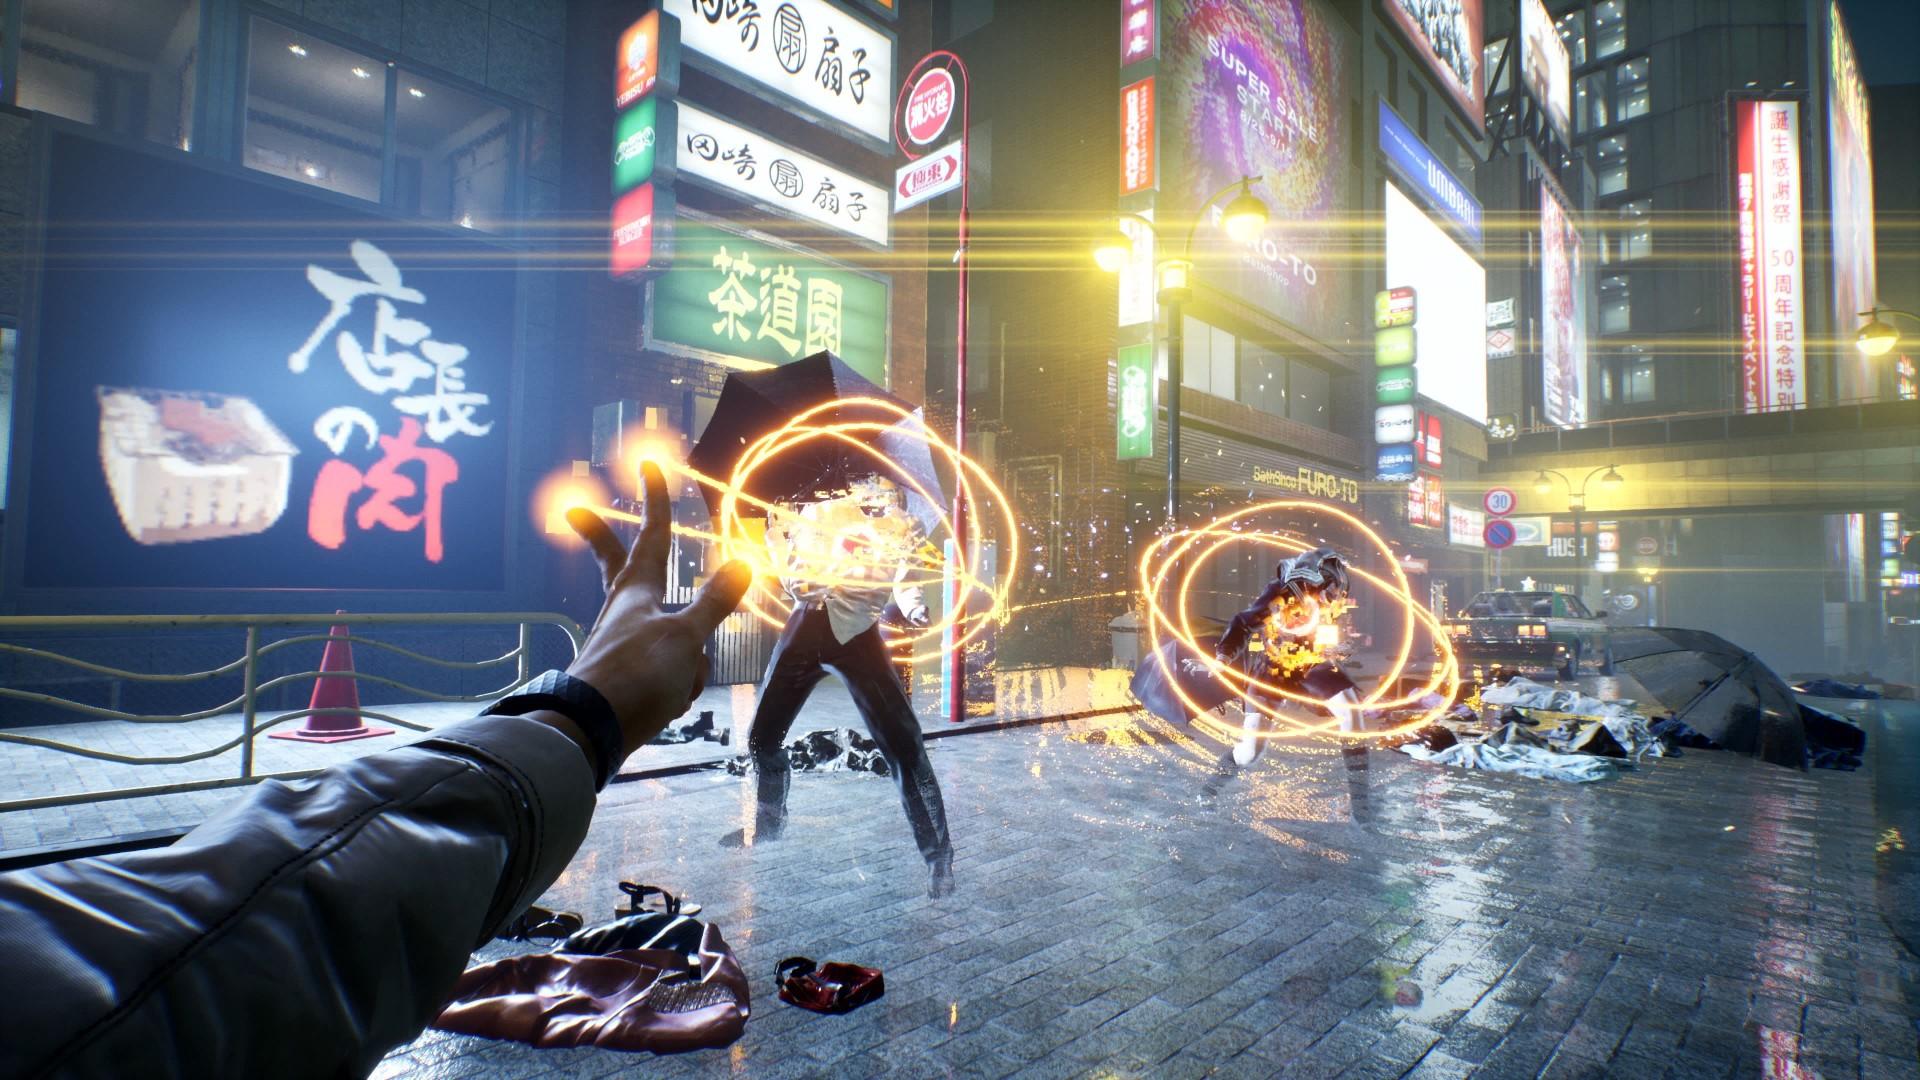 Ghostwire: Tokyo has been delayed until next year